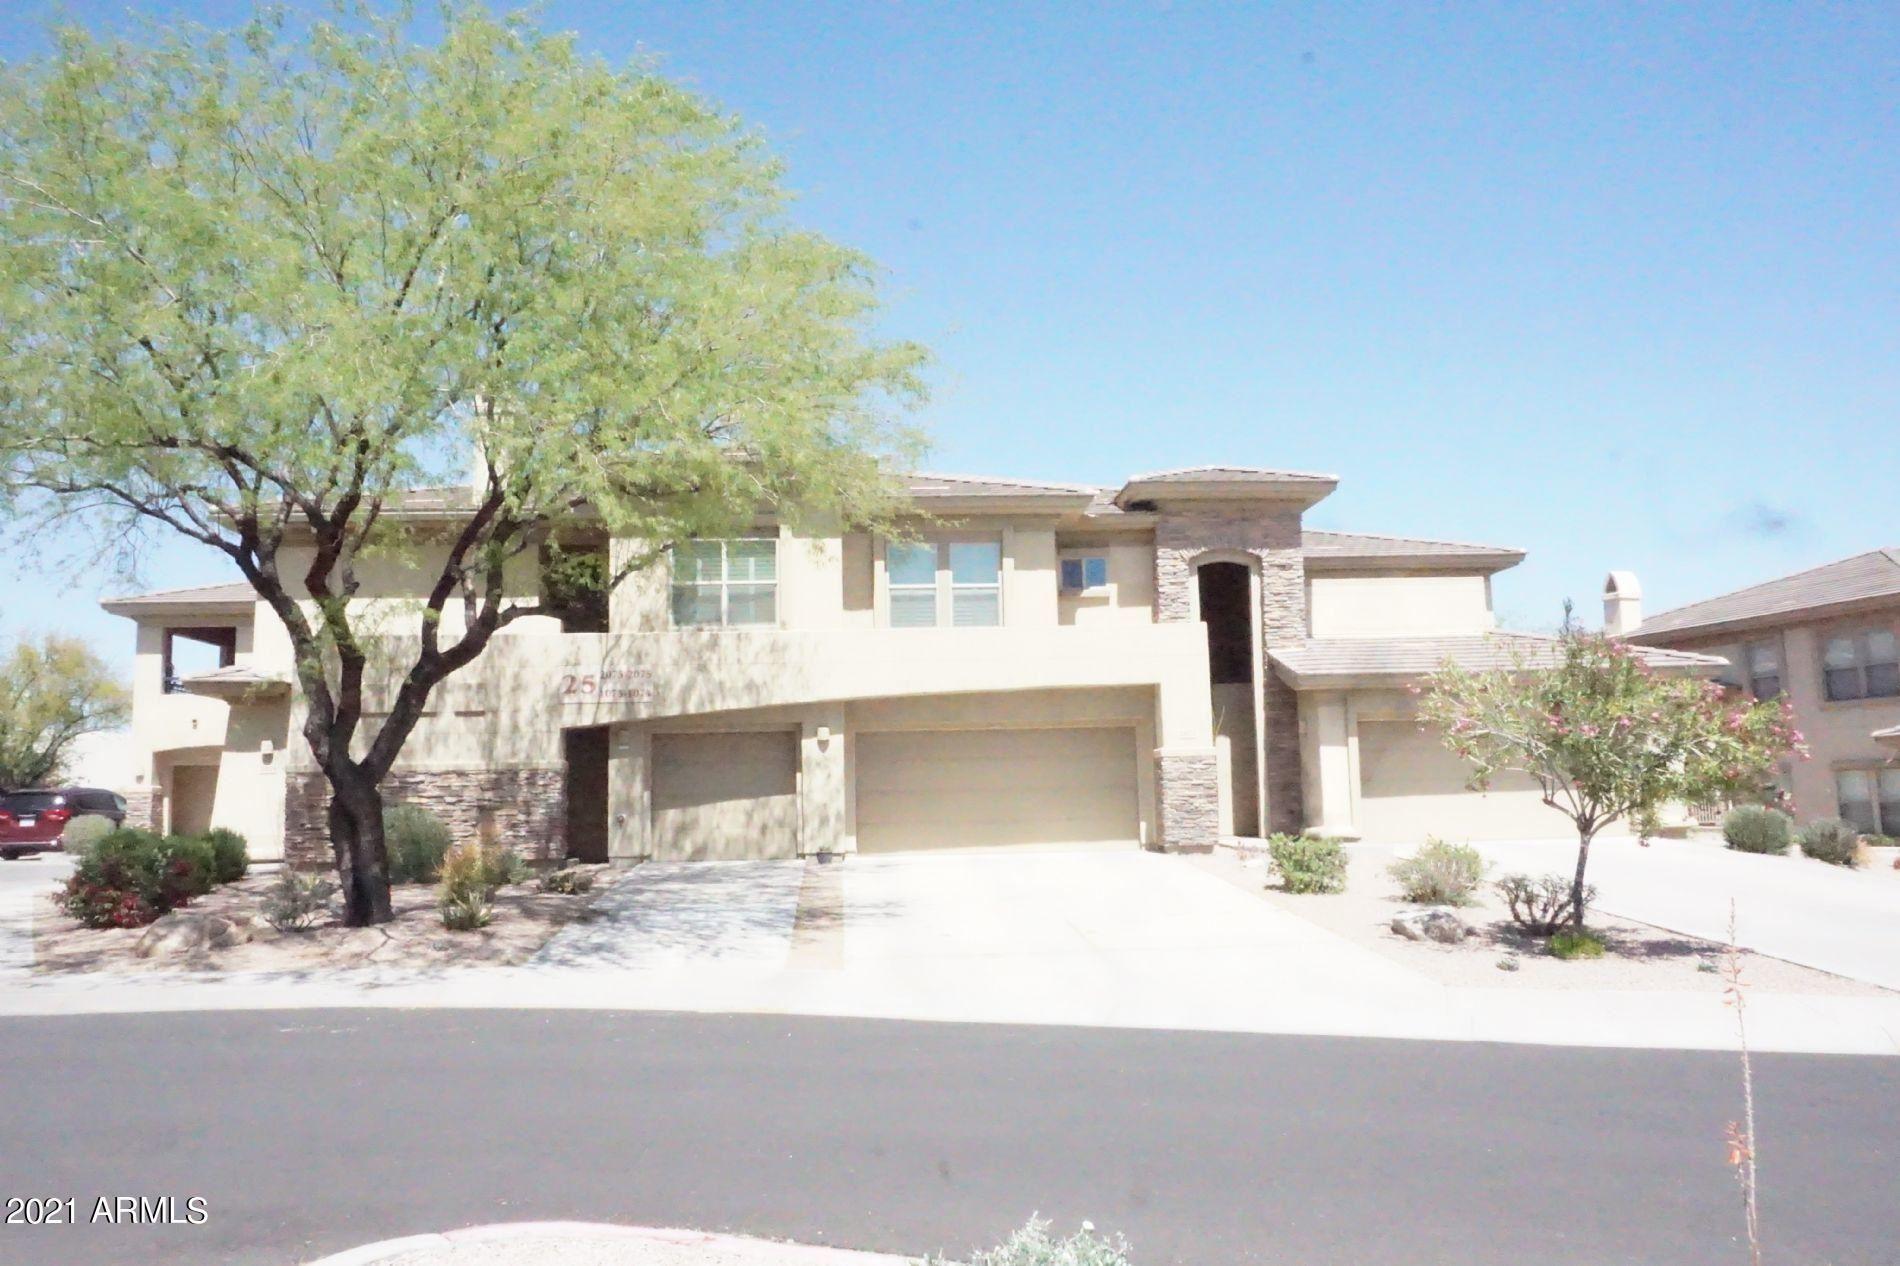 Photo of 16800 E EL LAGO Boulevard #2075, Fountain Hills, AZ 85268 (MLS # 6232051)